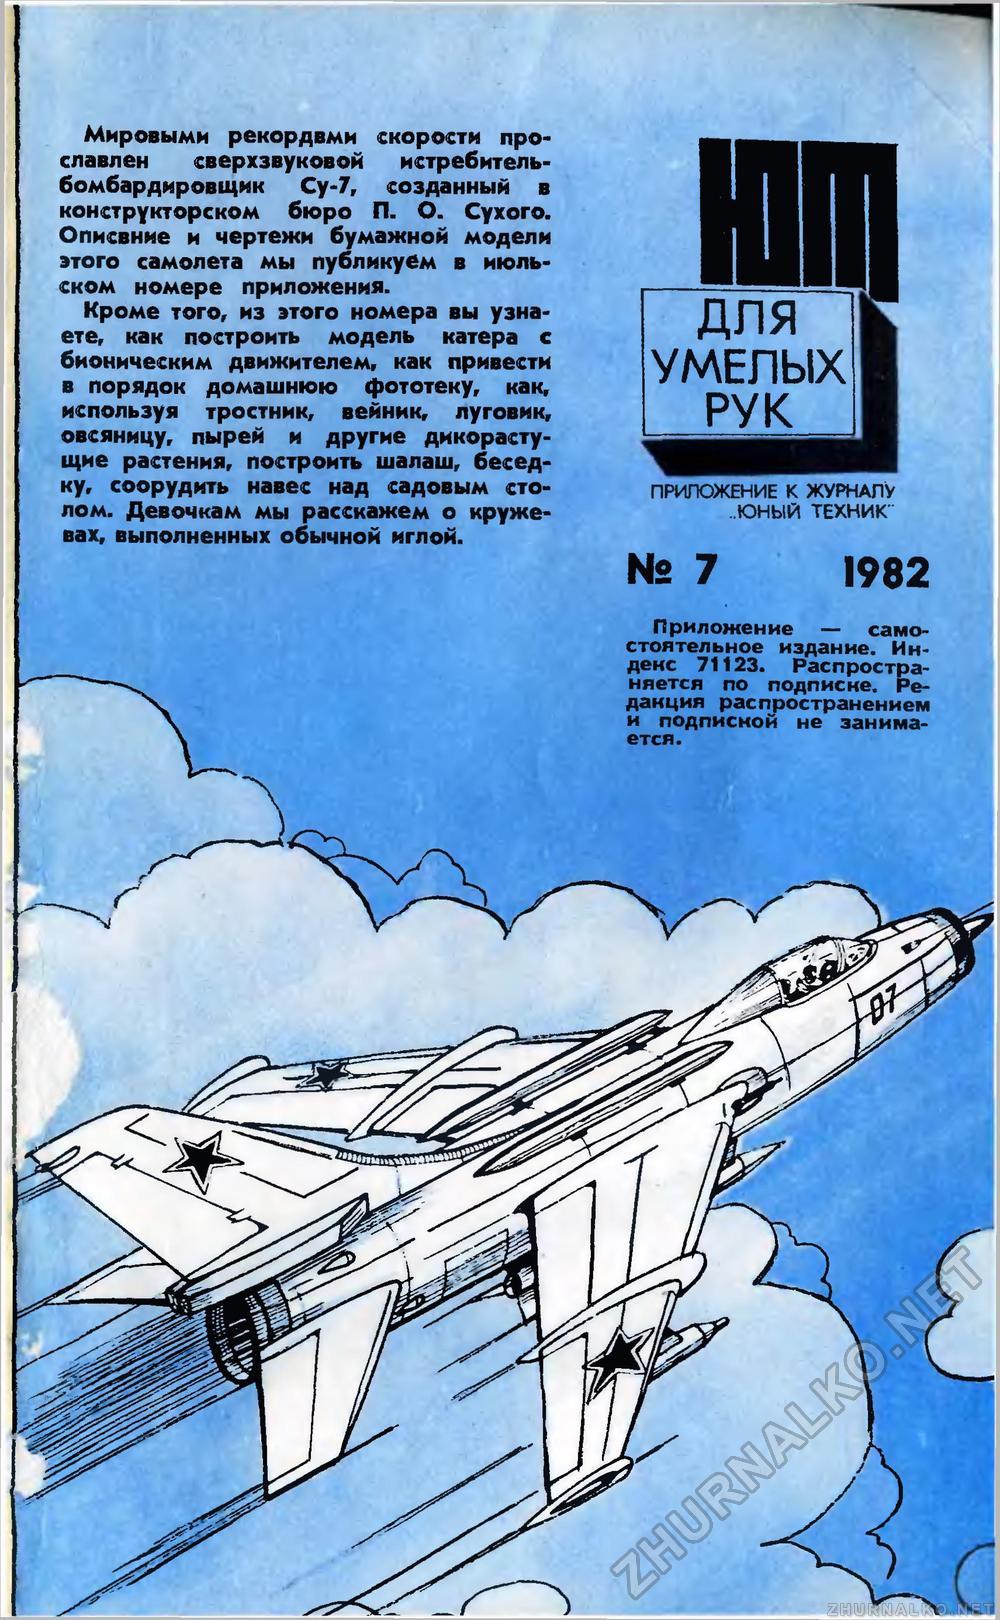 Юный техник 1982-07, страница 83: http://zhurnalko.net/=sam/junyj-tehnik/1982-07--num83